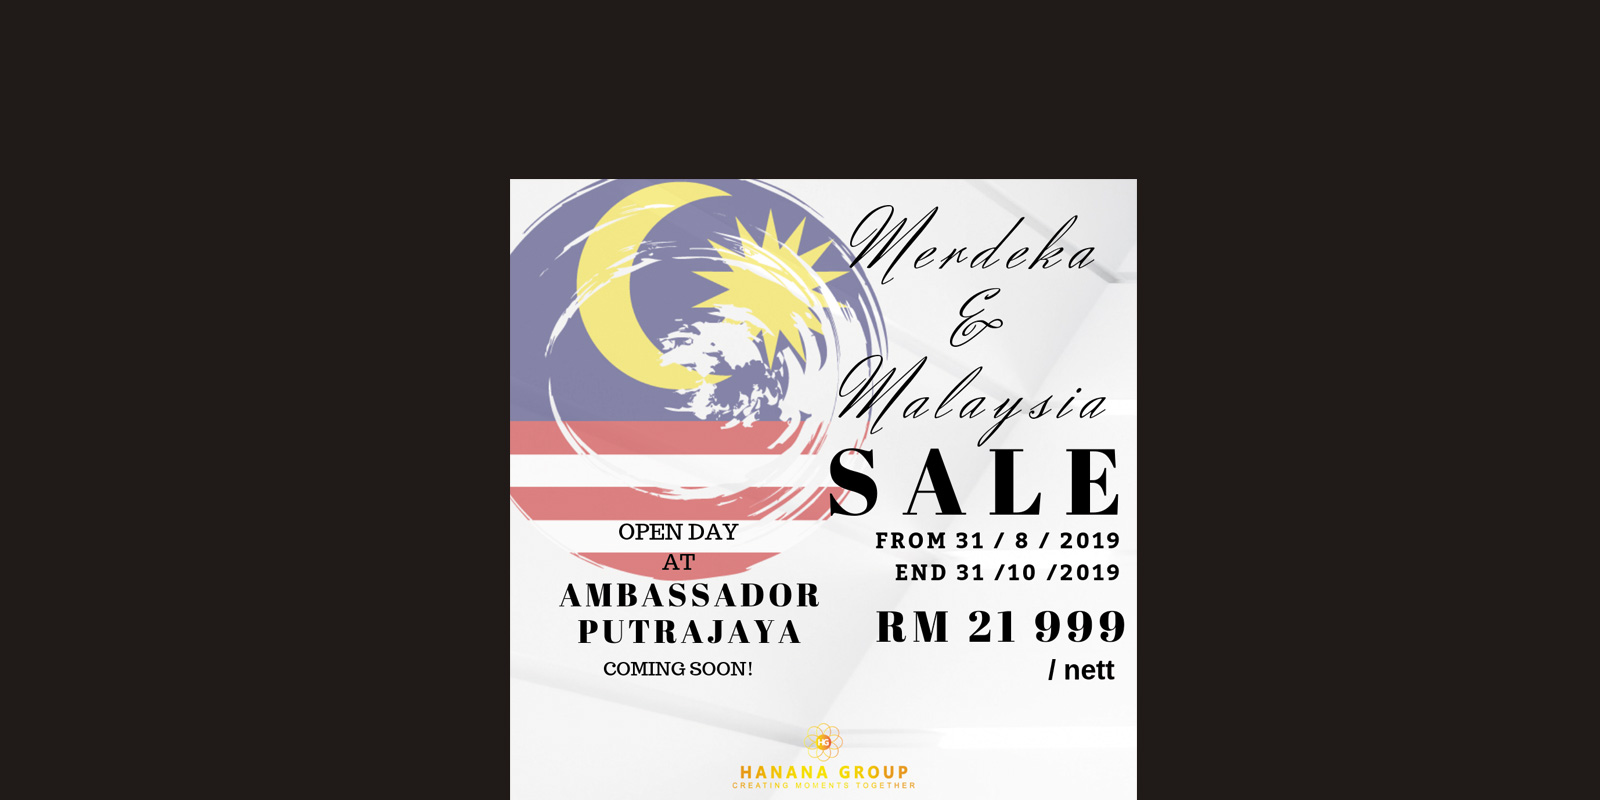 MERDEKA-AND-MALAYSIA-DAY-SALE-2019